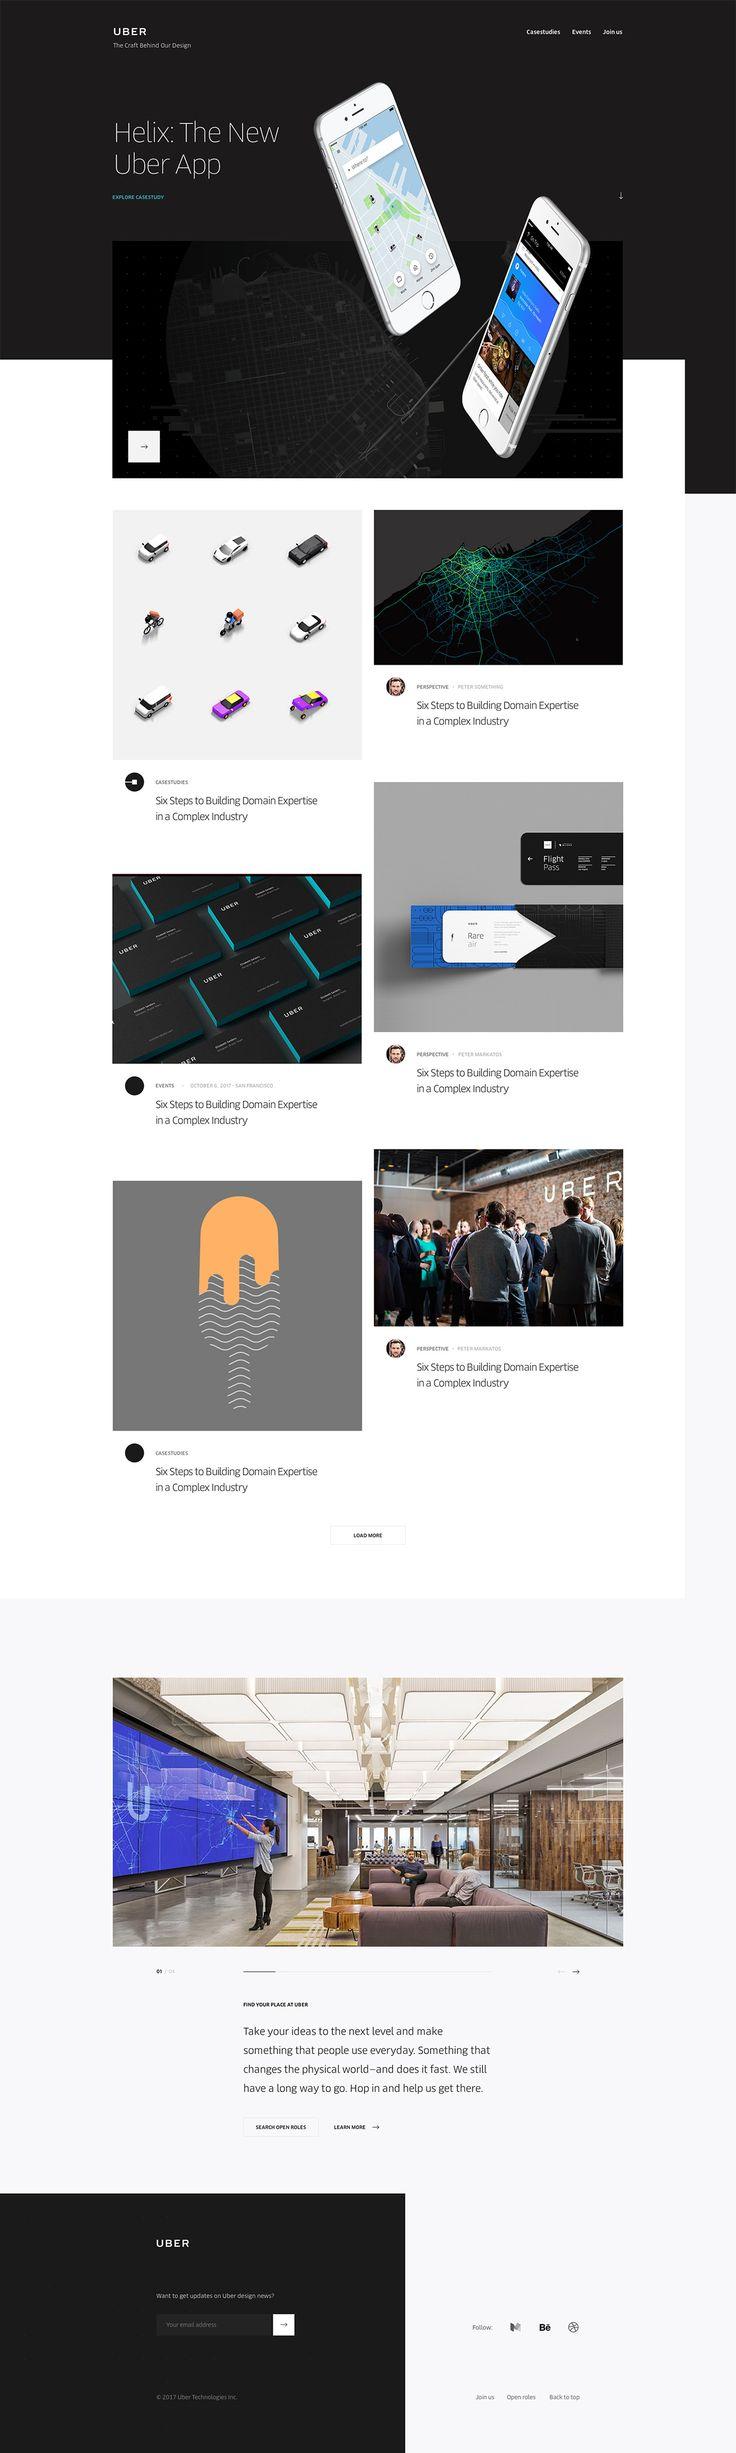 Uber Design – Ueno Case Study - Ueno. Digital agency. - Blog Design